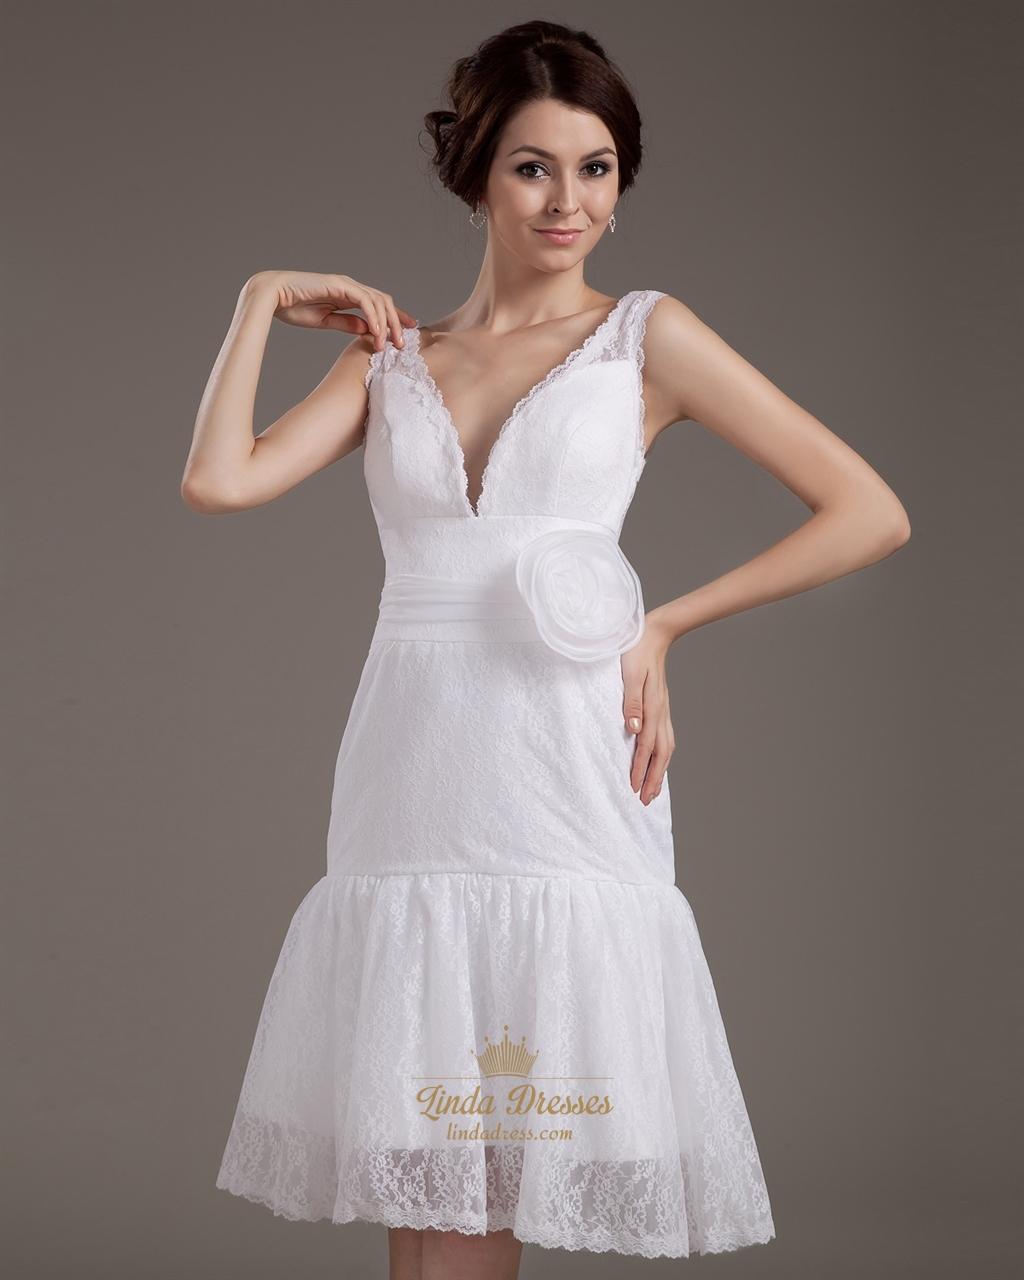 Unique vintage lace deep v back wedding dresses with for Deep v back wedding dress